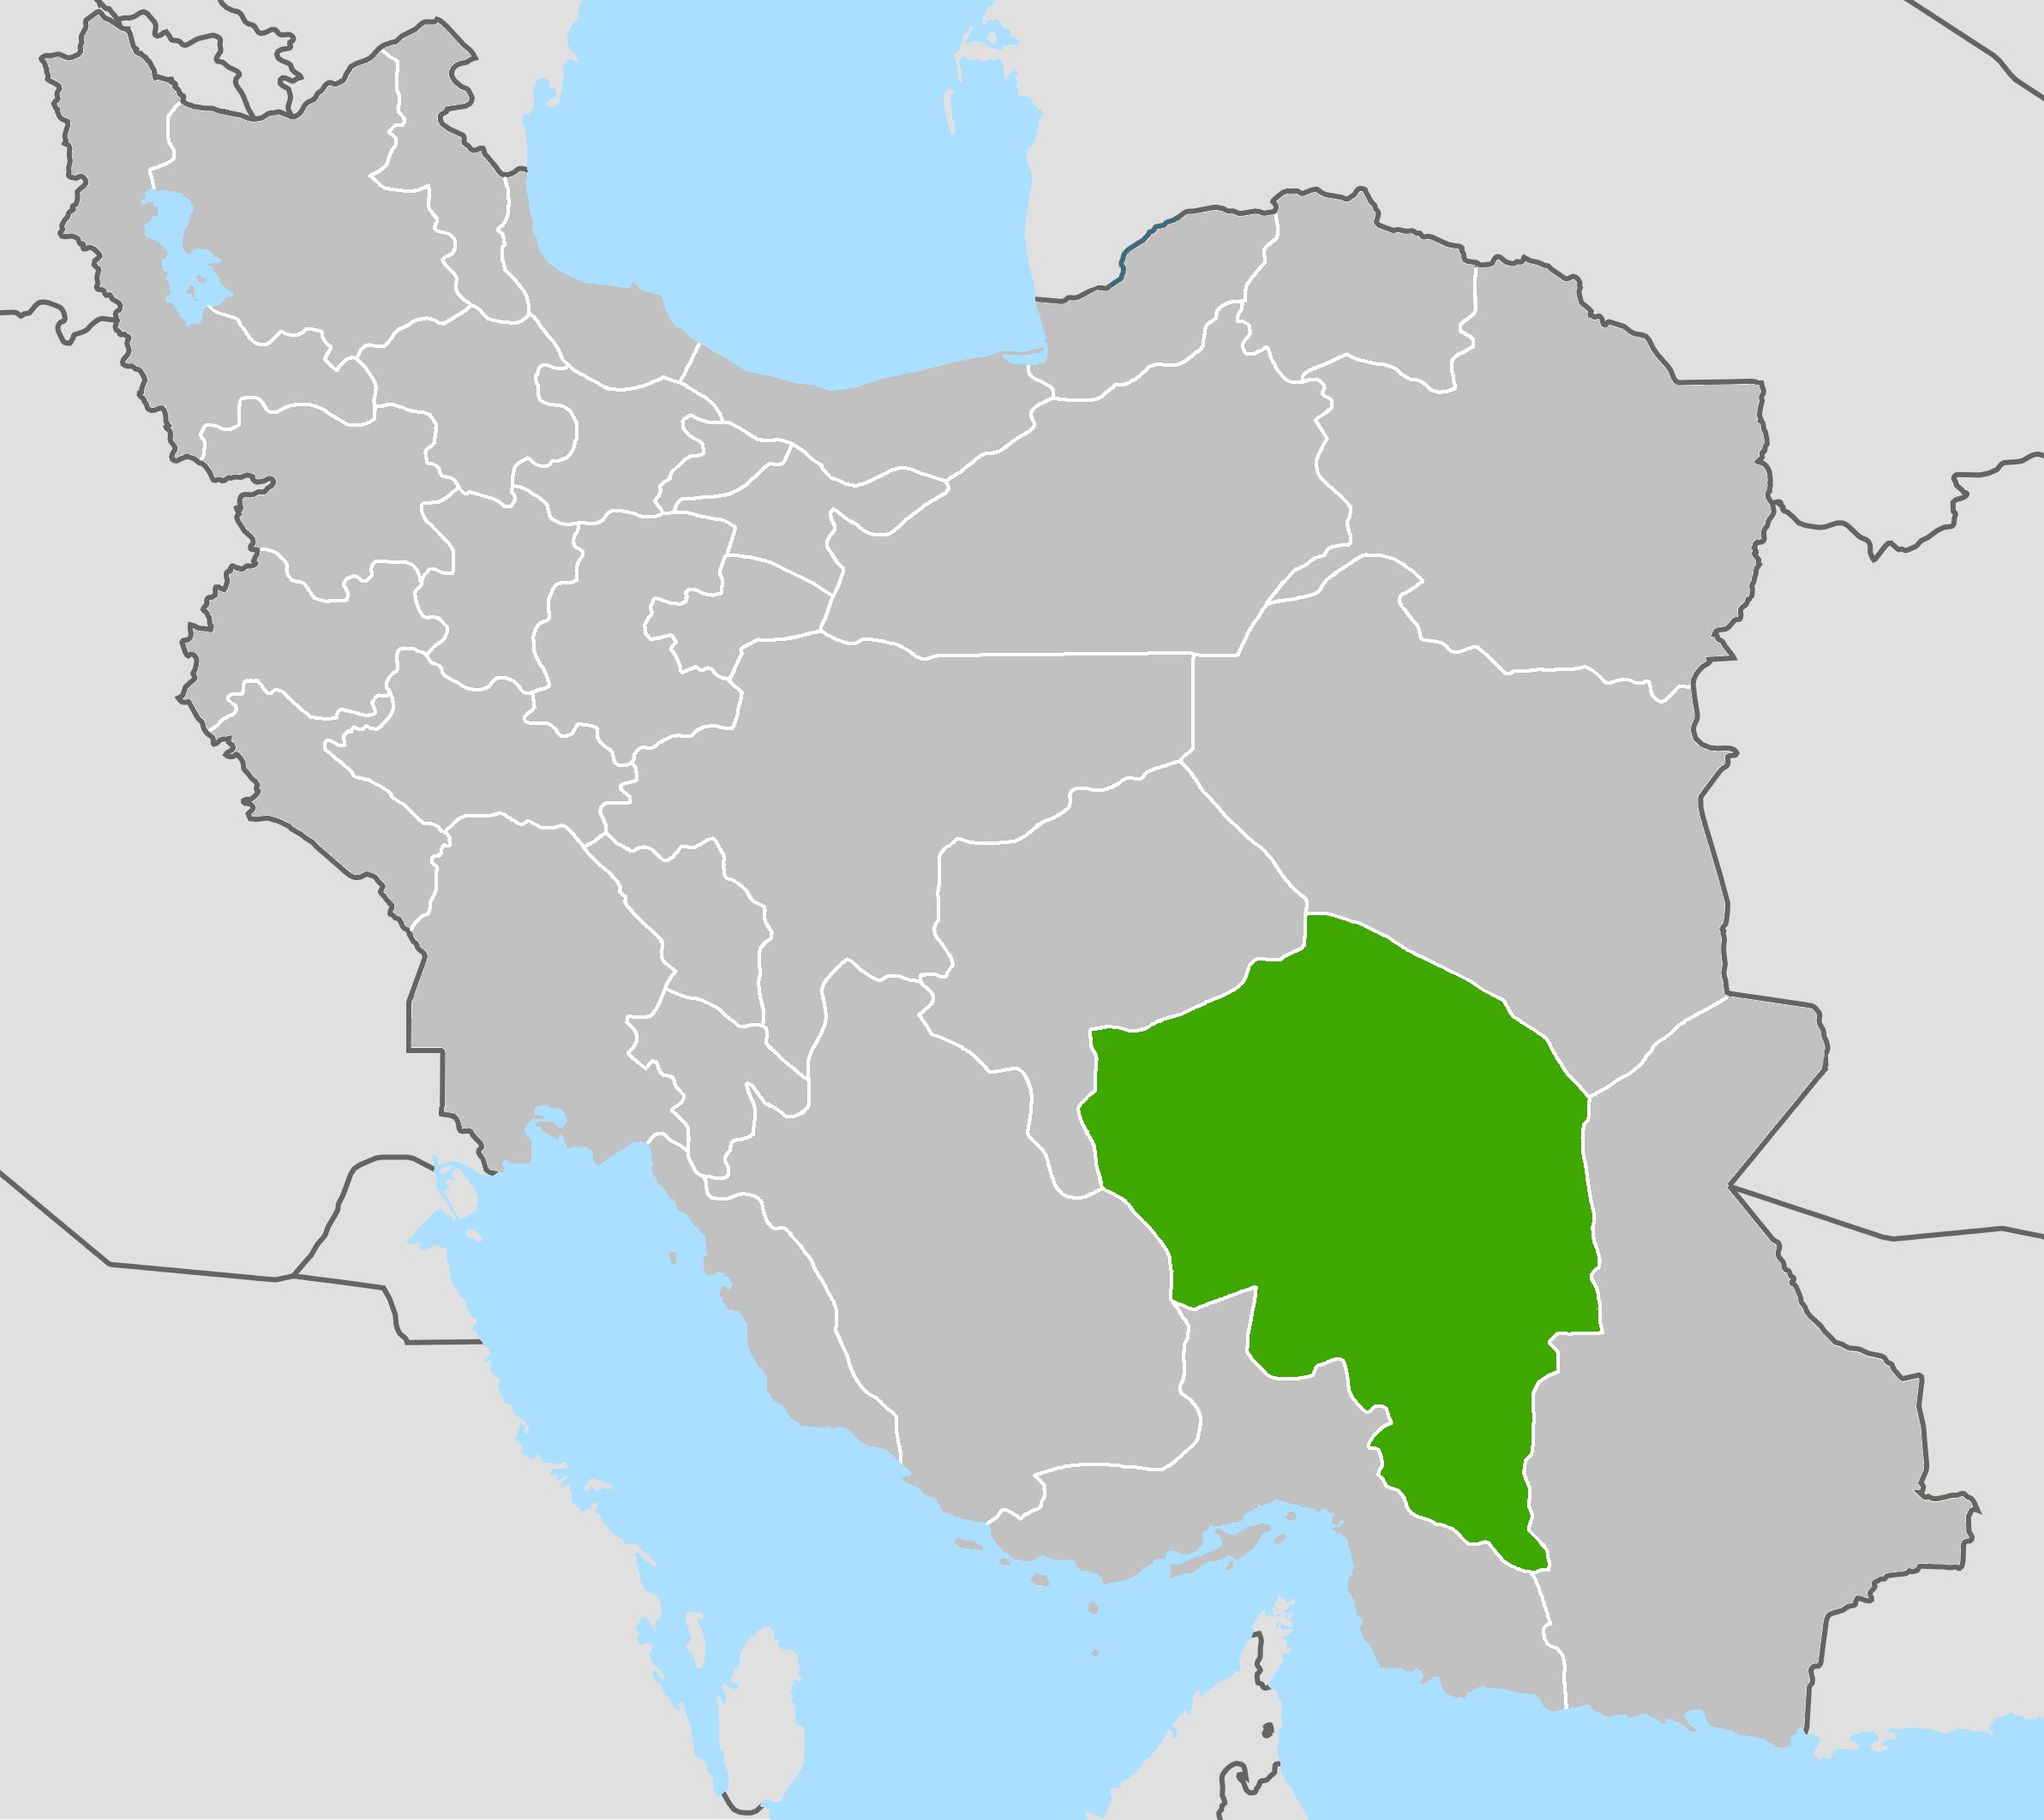 FileIRANOSTANKERMANPNG Wikimedia Commons